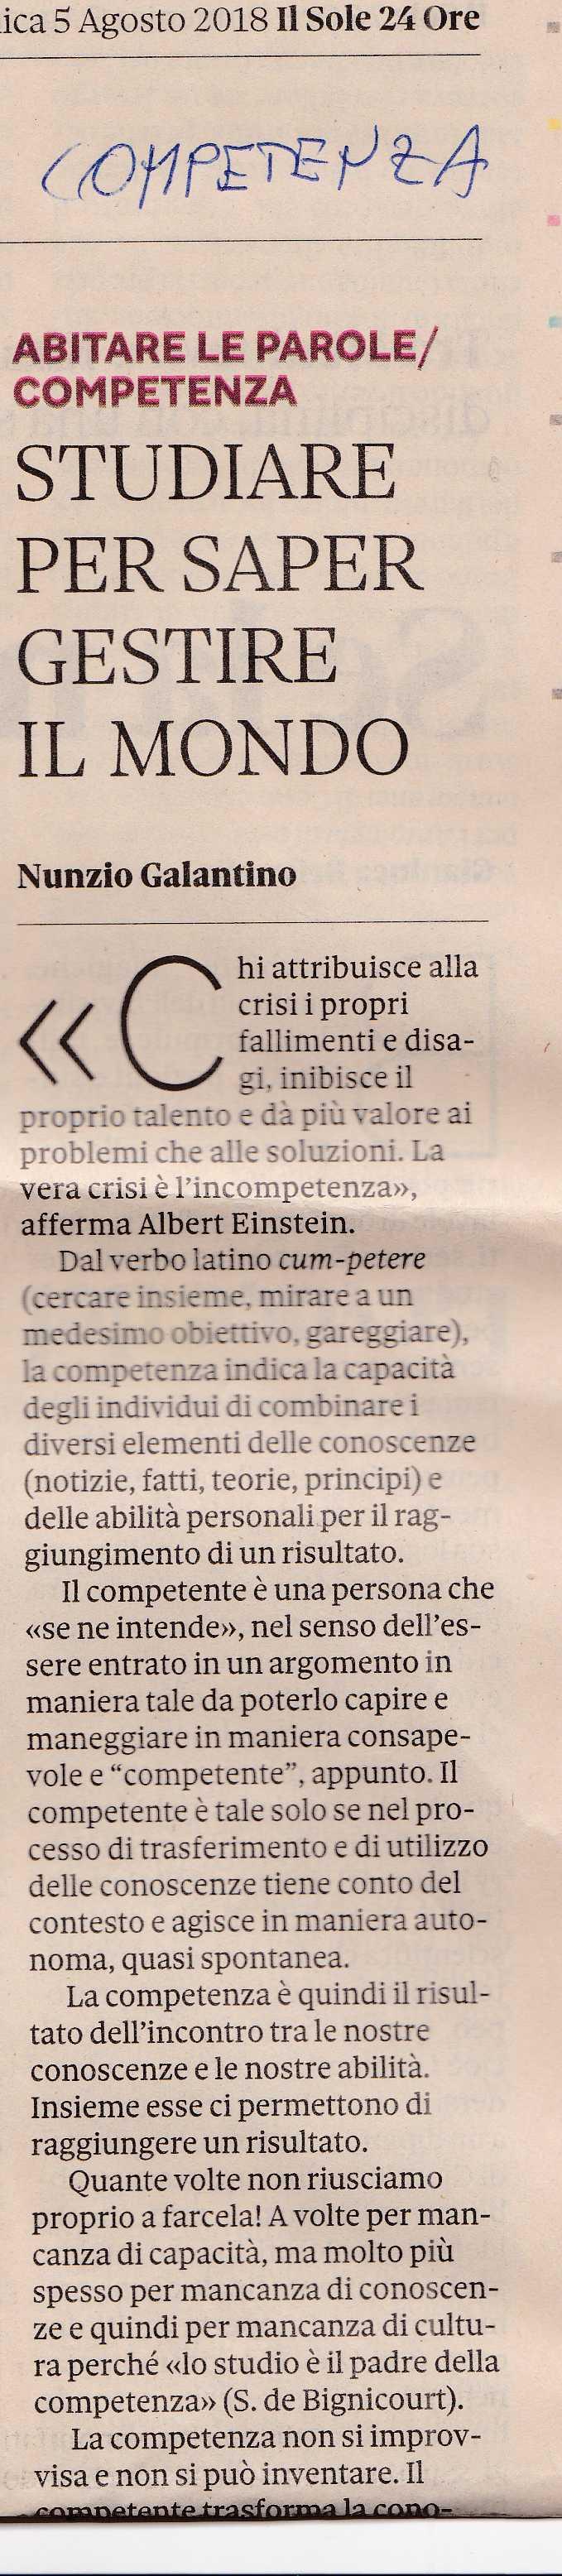 competenza3312